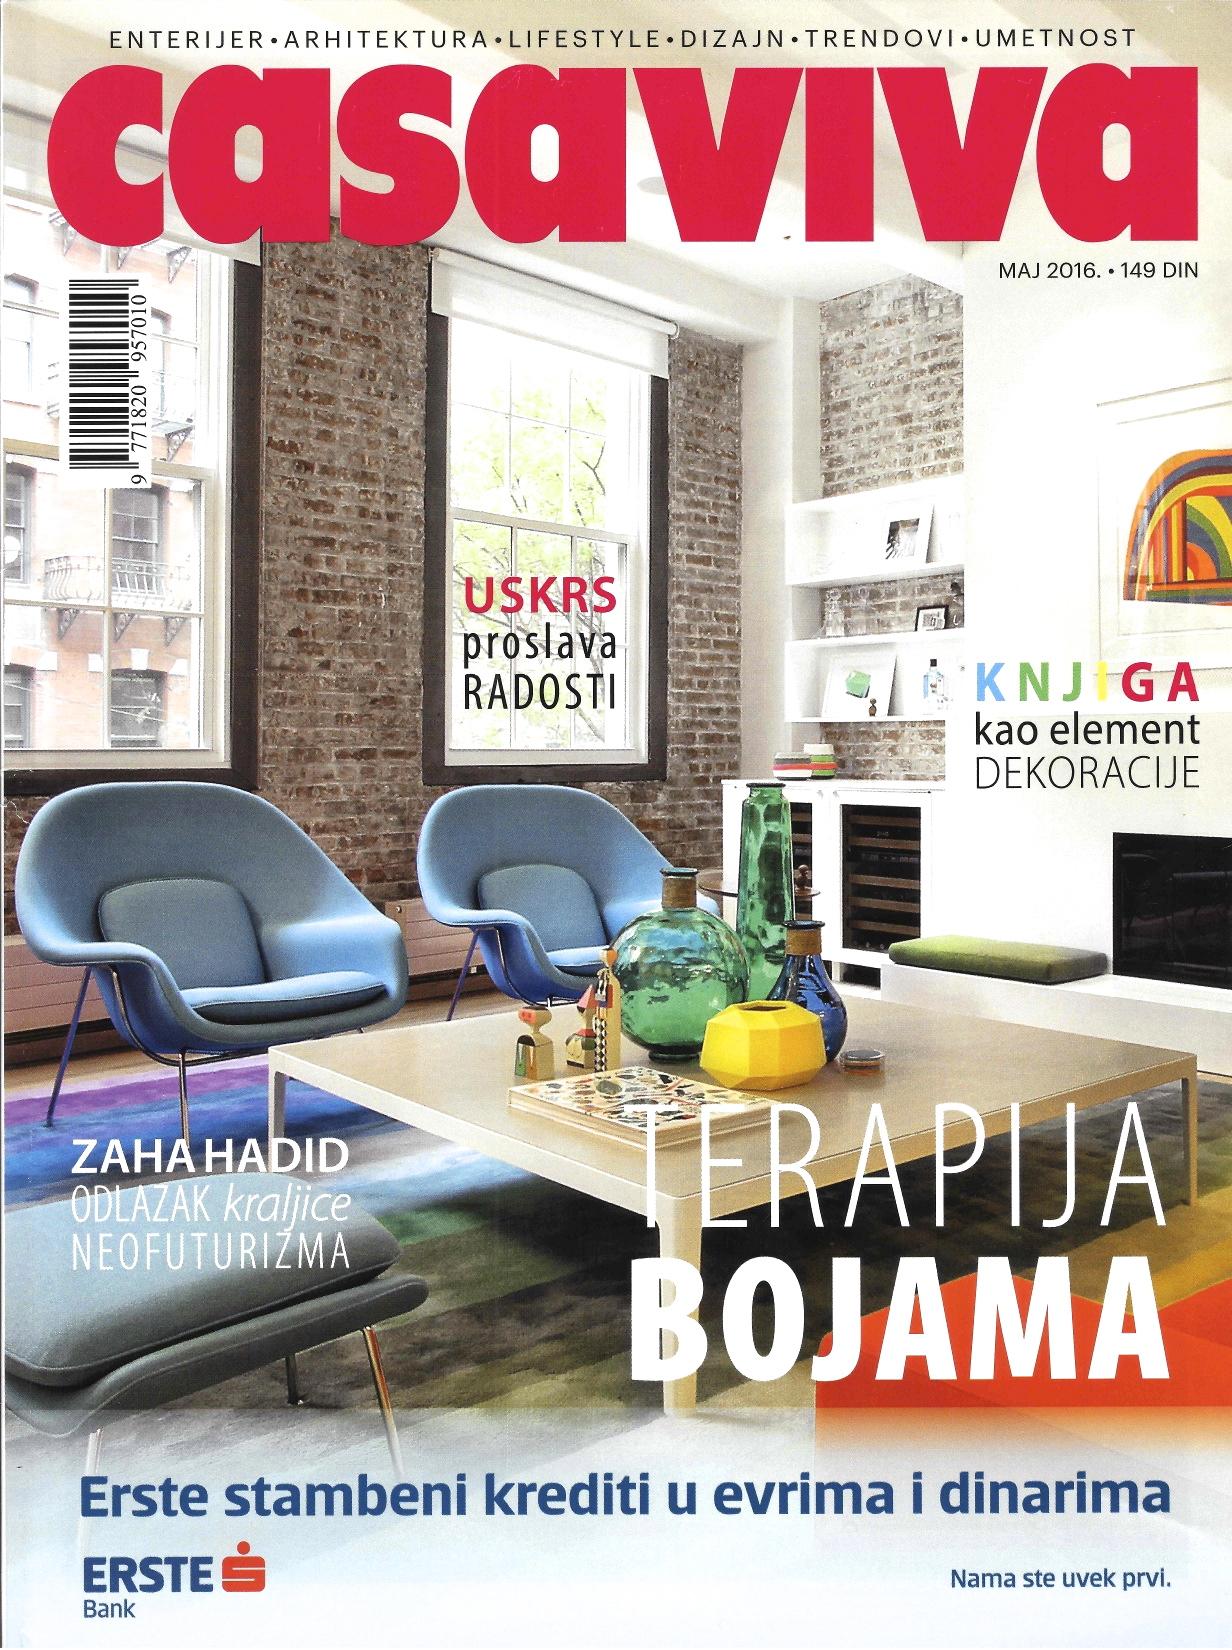 © ghislaine viñas interior design-casaviva.05.16.jpg